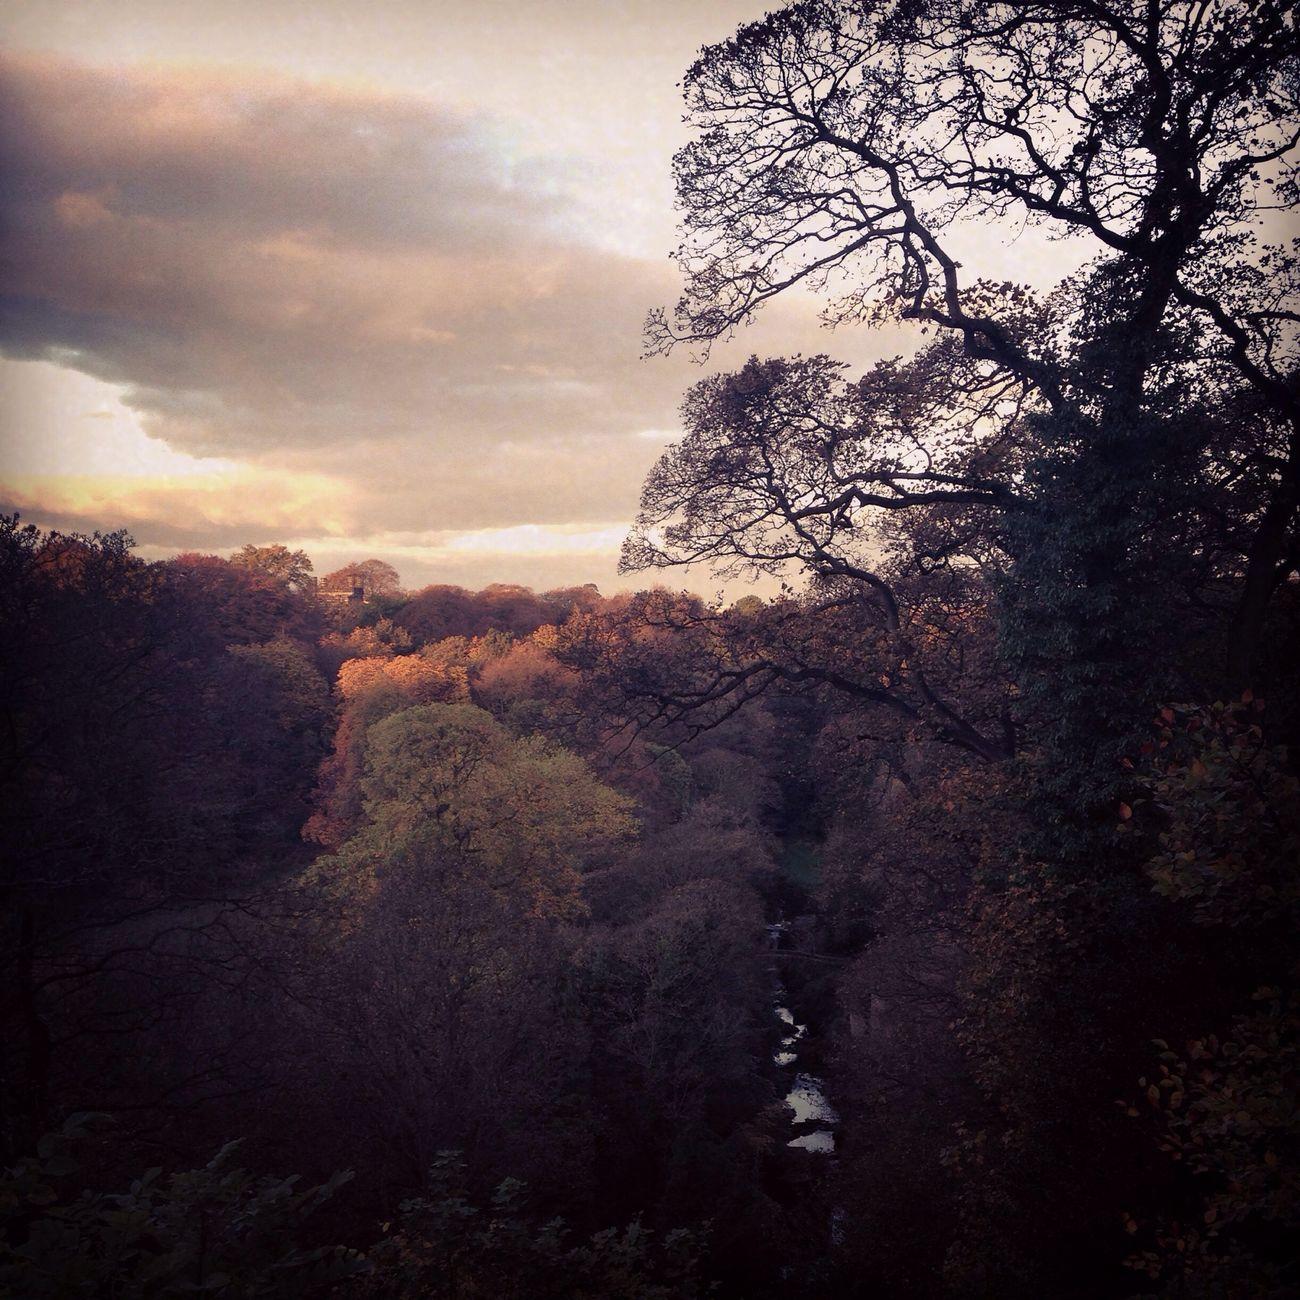 Autumn Colors Of Autumn Scenery EyeEm Best Shots